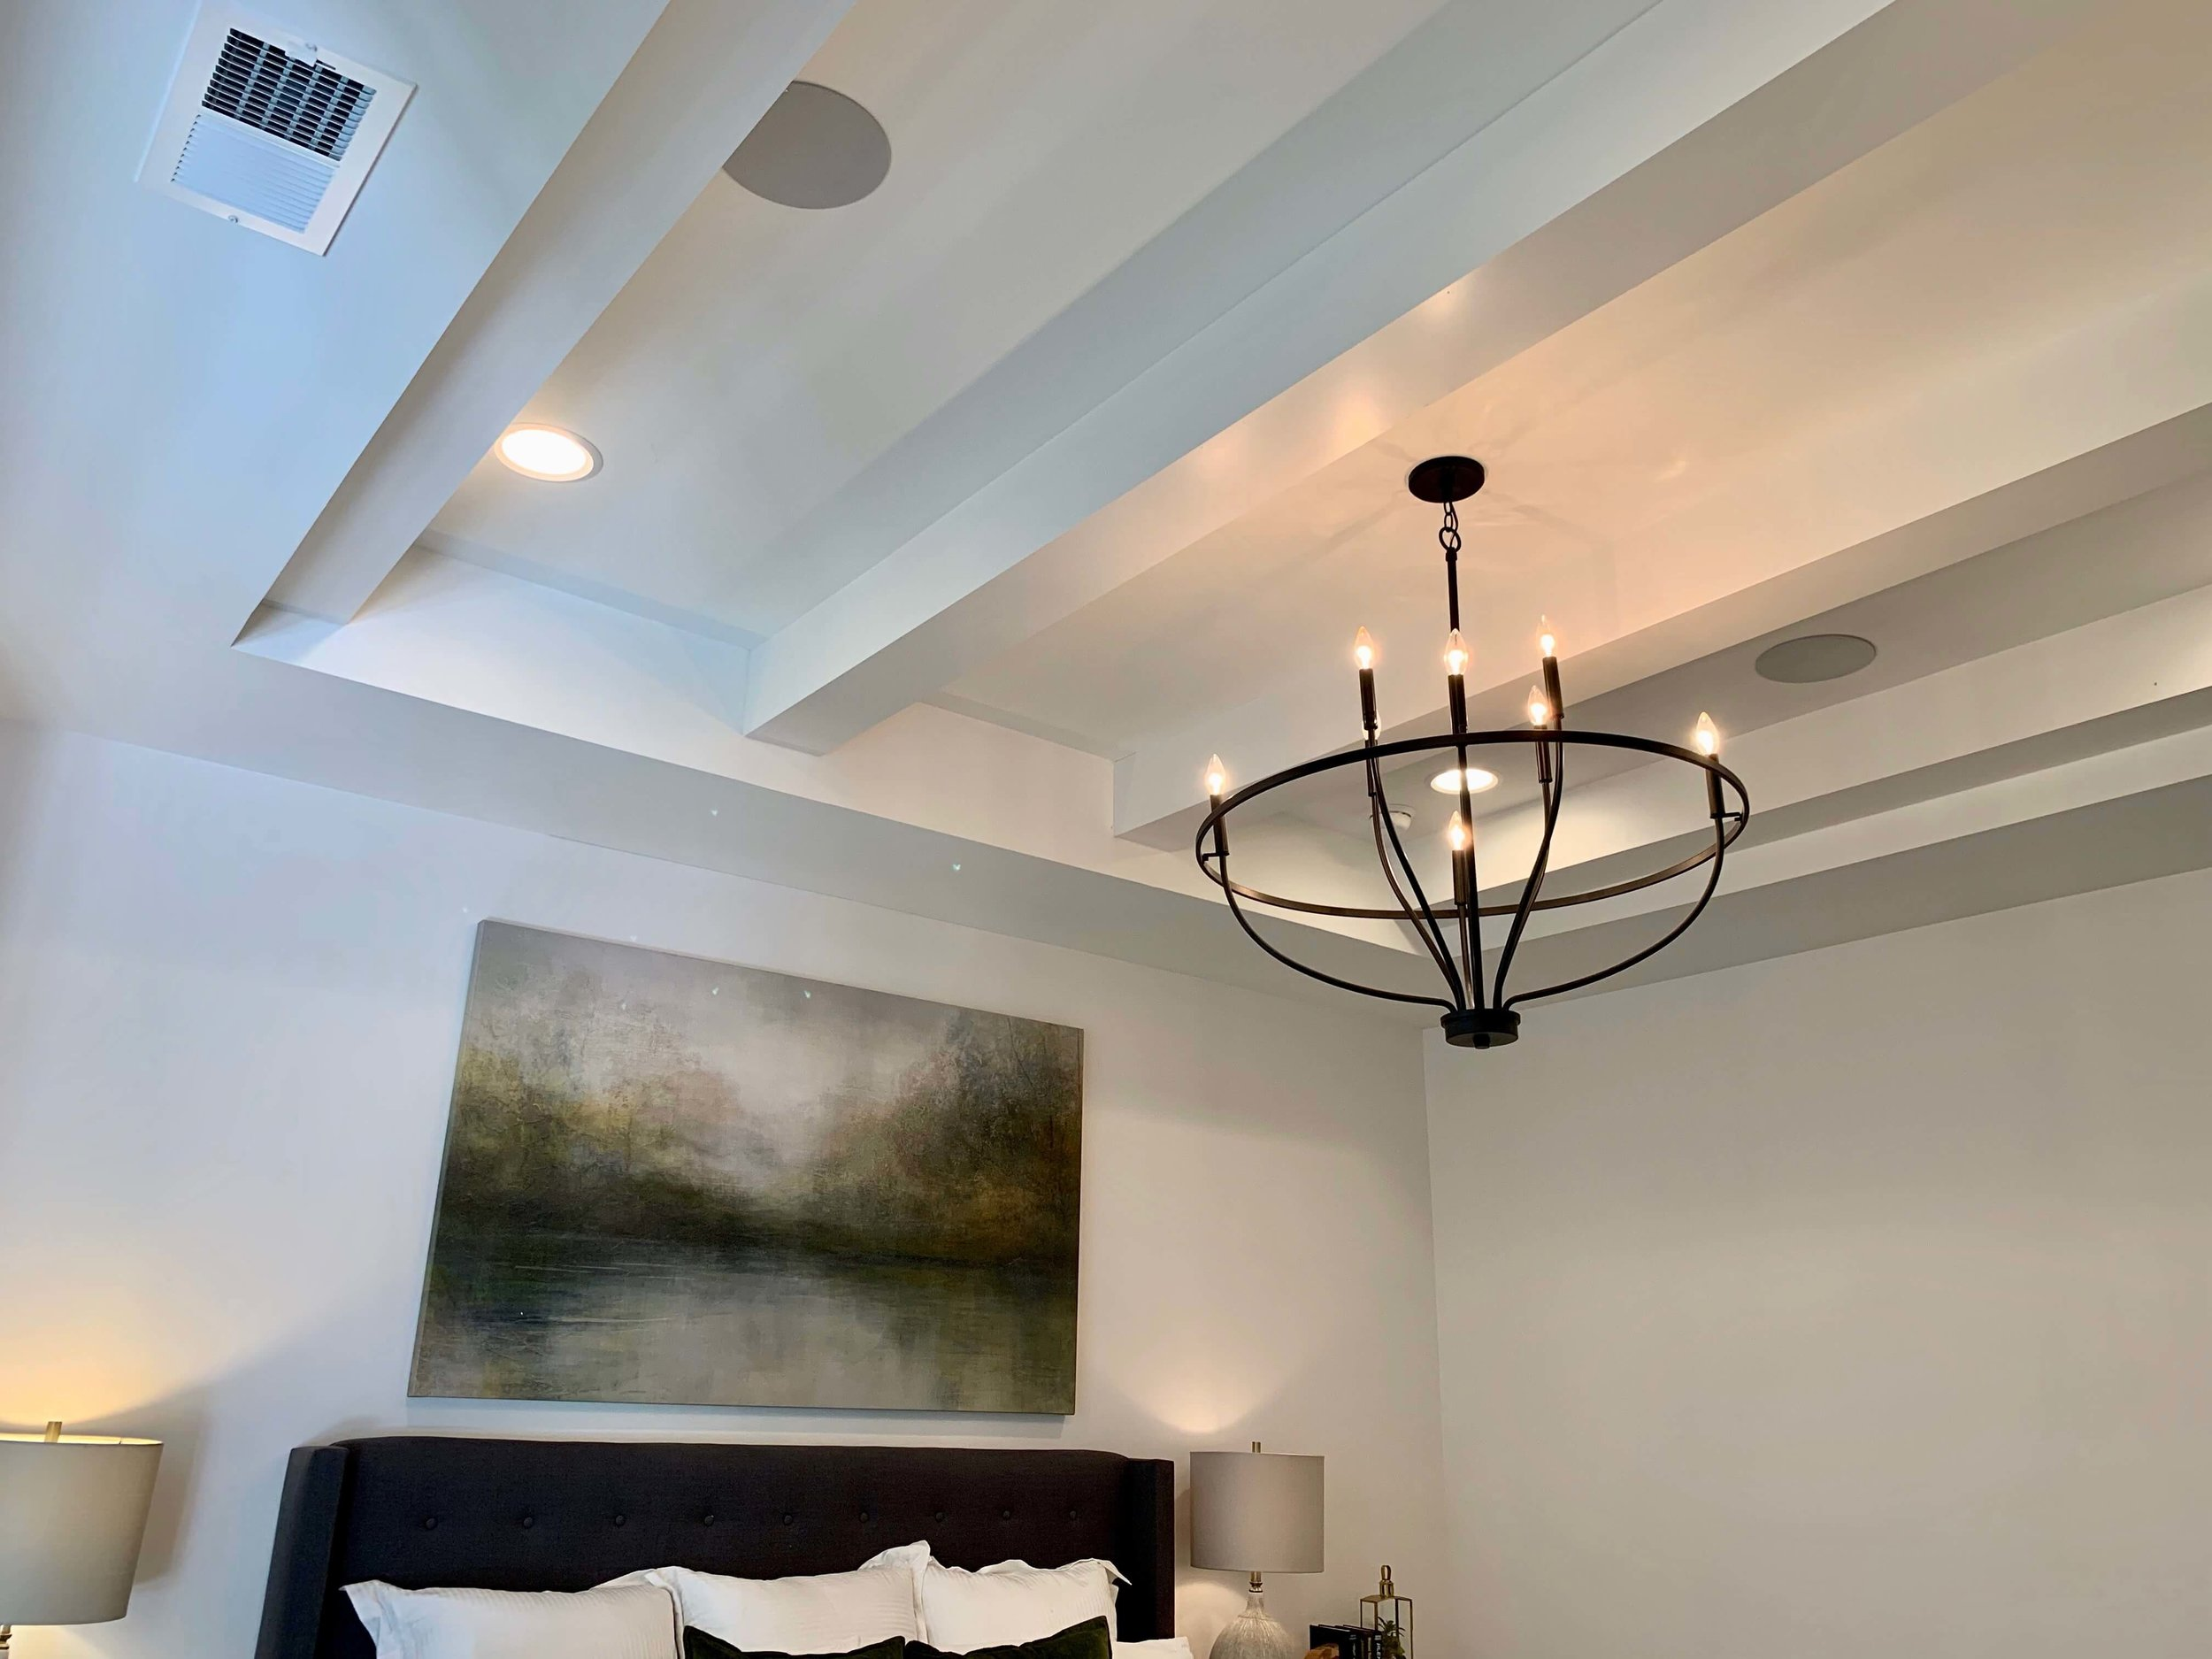 decorating_ideas_construction_ceiling_lighting.jpeg